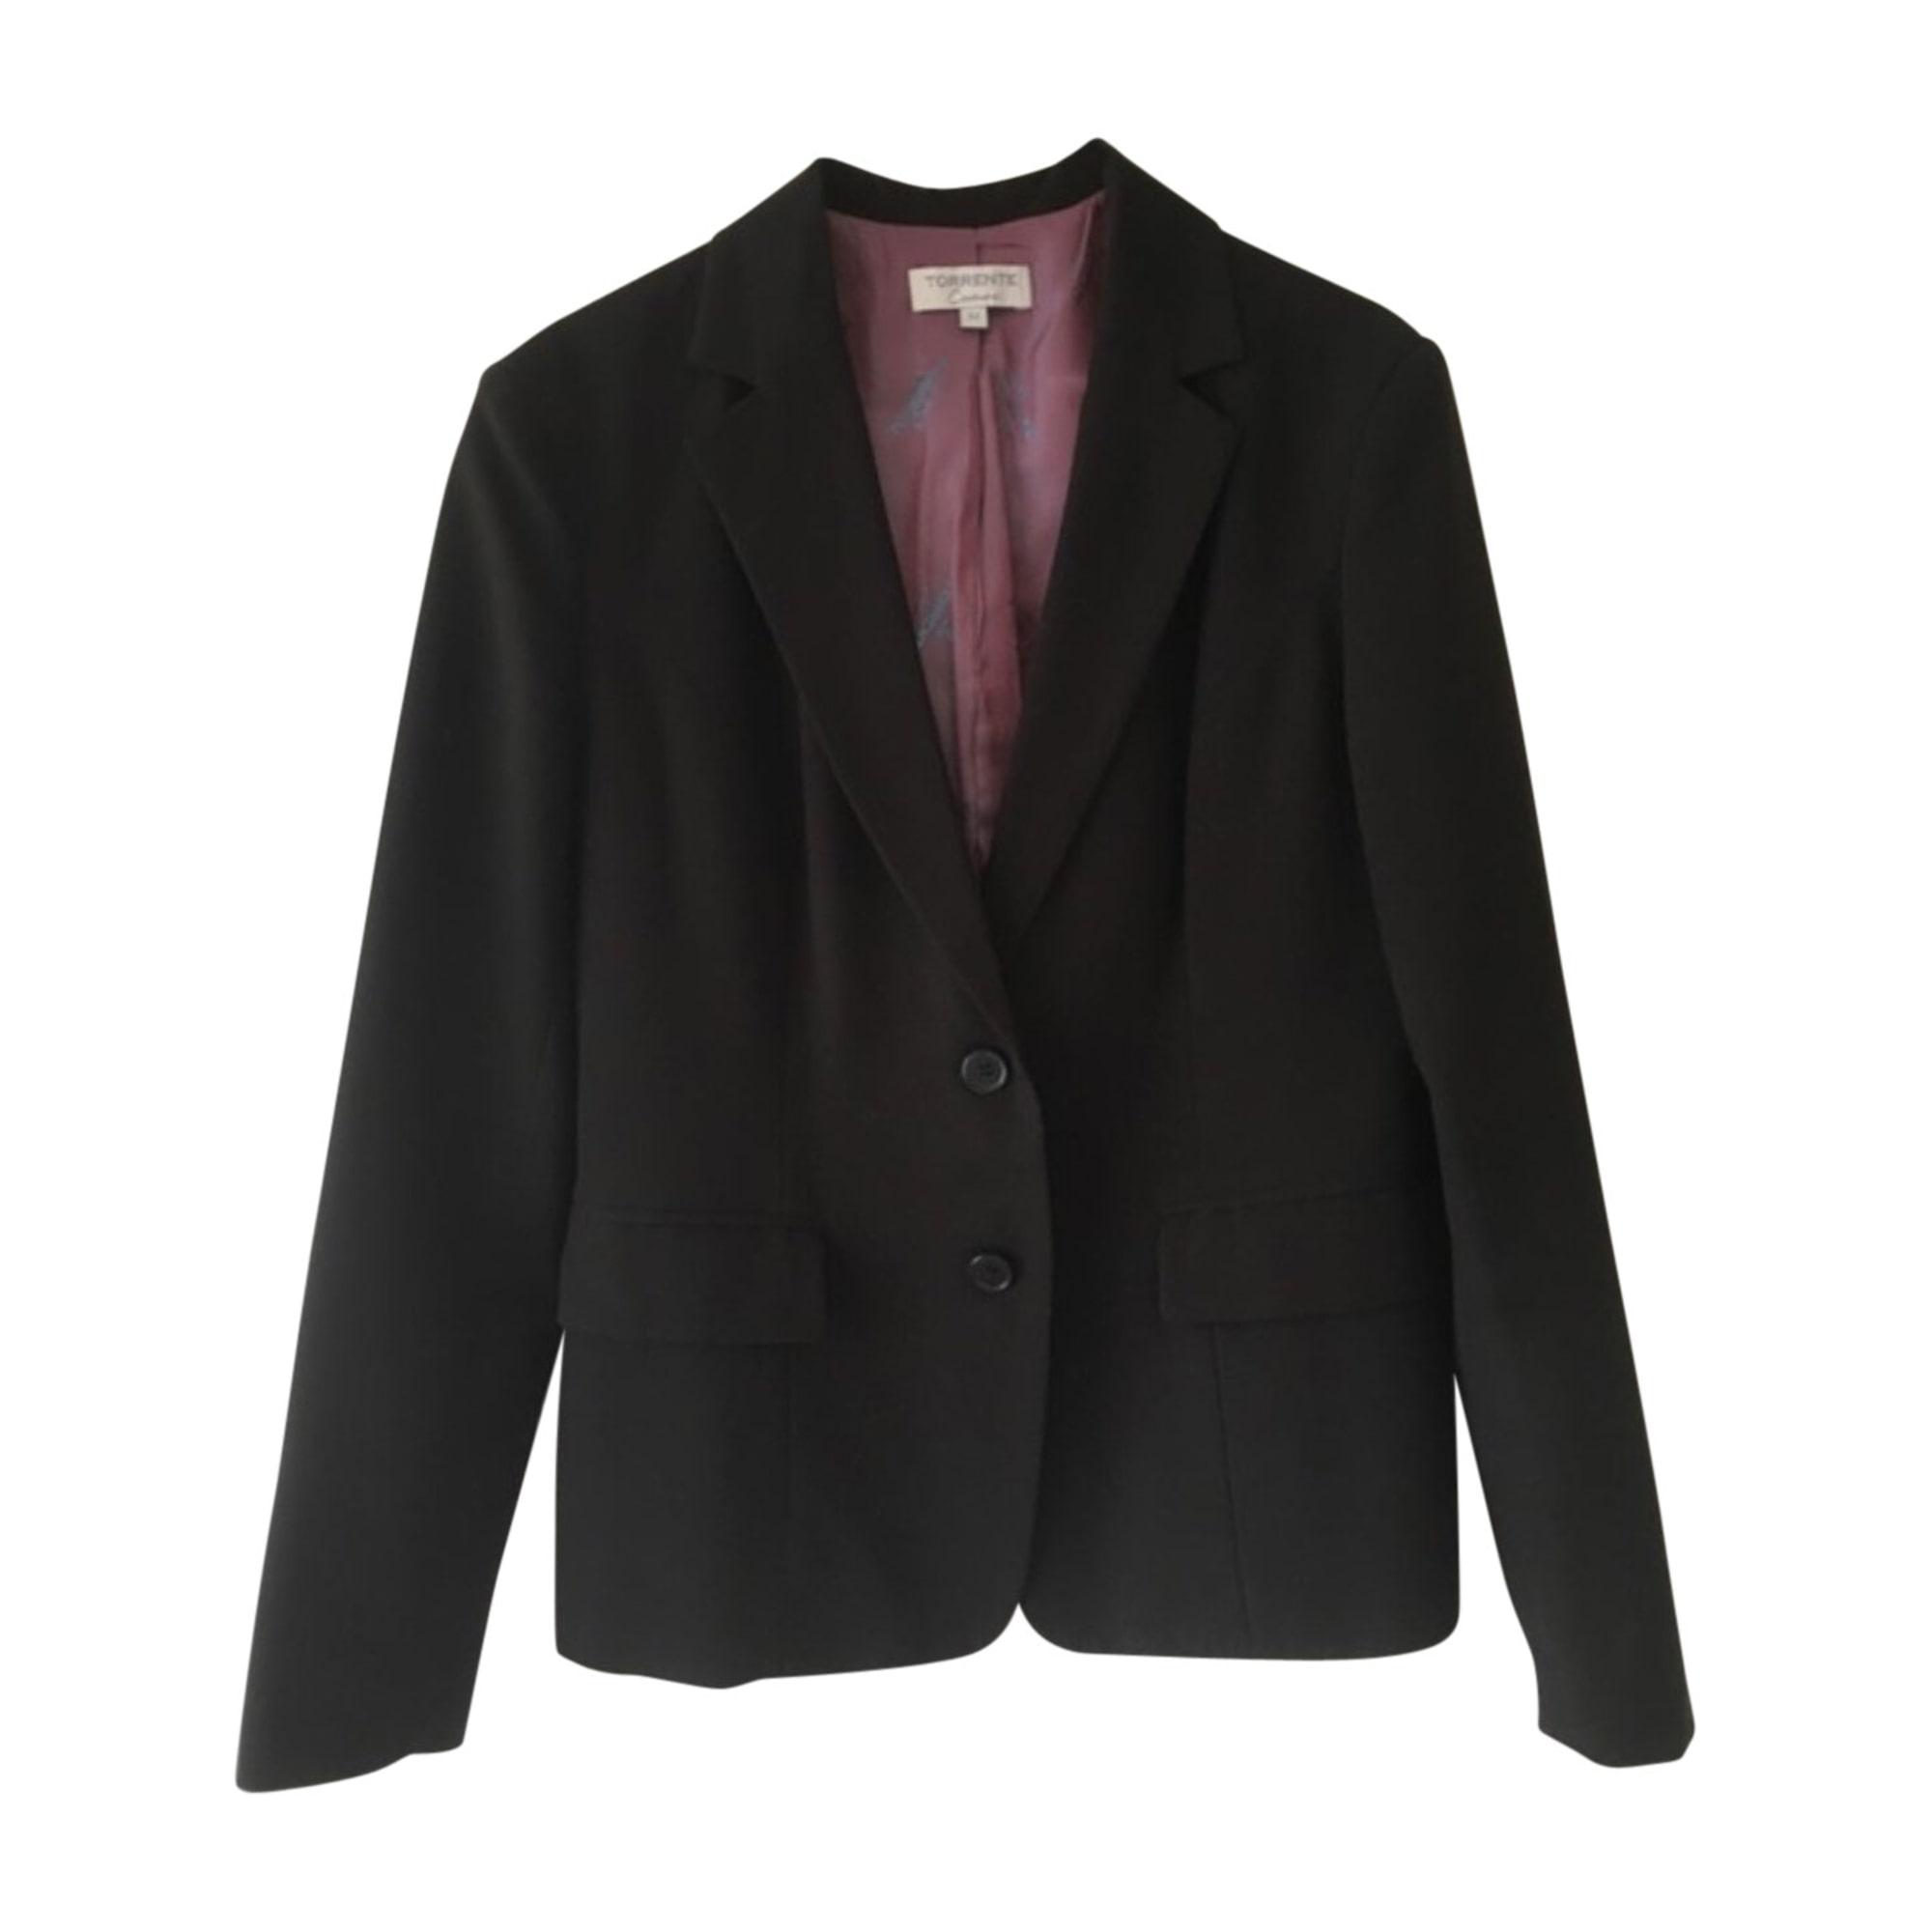 Blazer, veste tailleur TORRENTE 44 (XLXXL, T5) noir 6900773